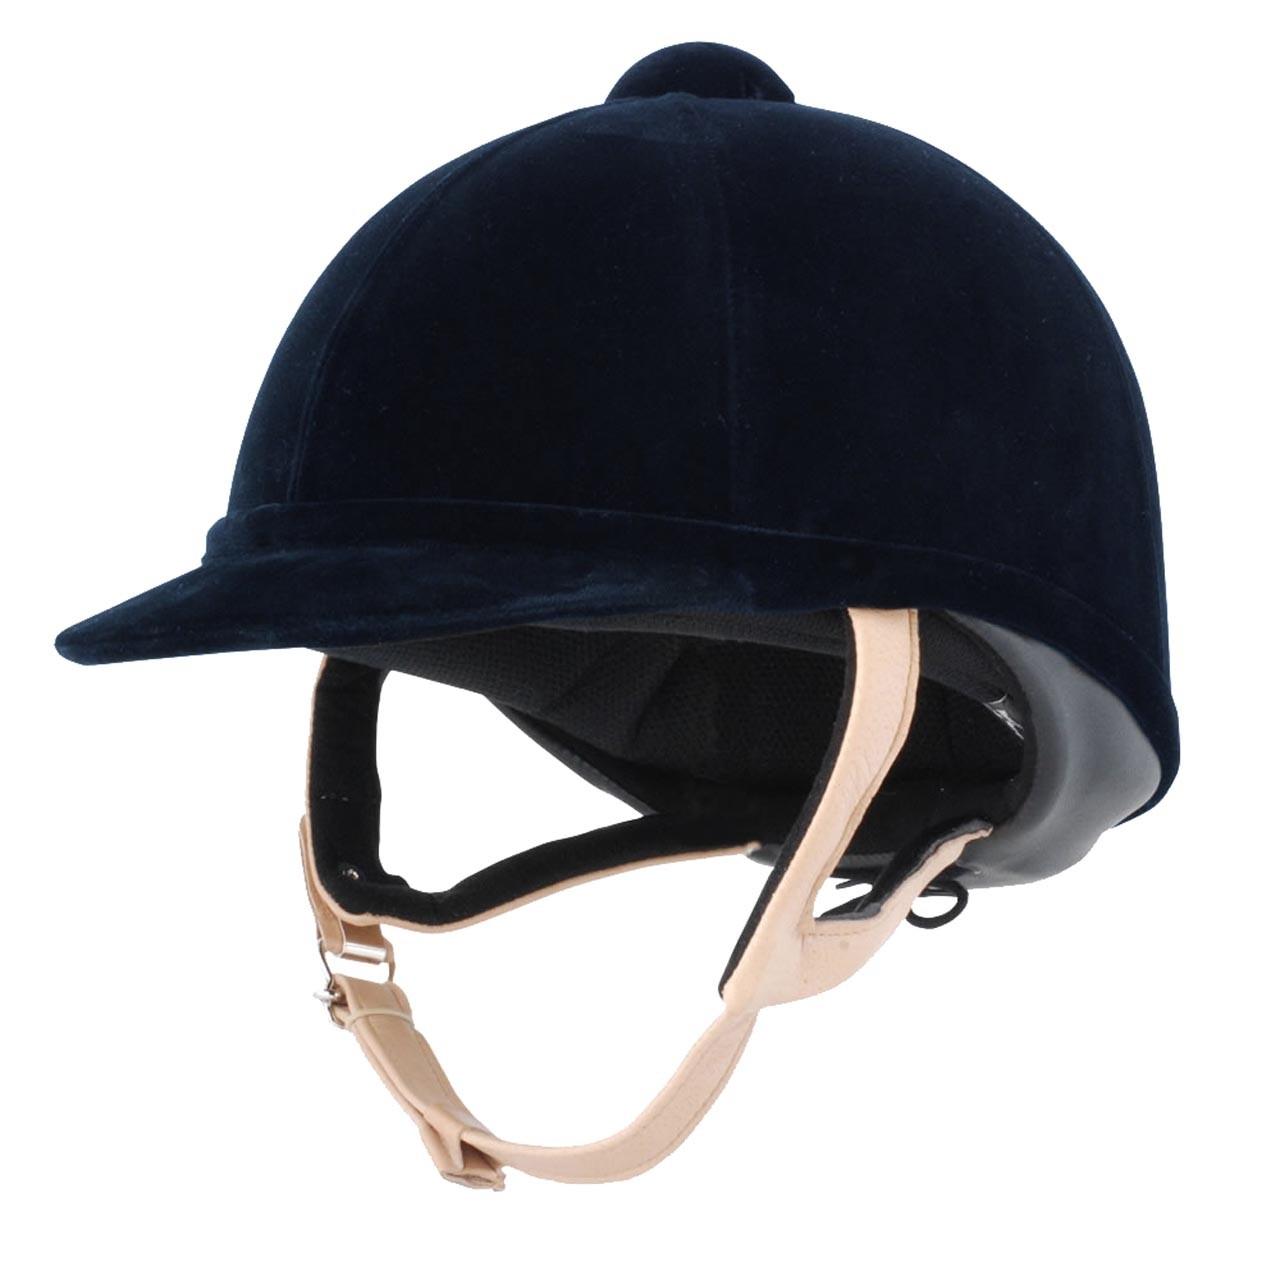 Charles Owen Wellington classic cap